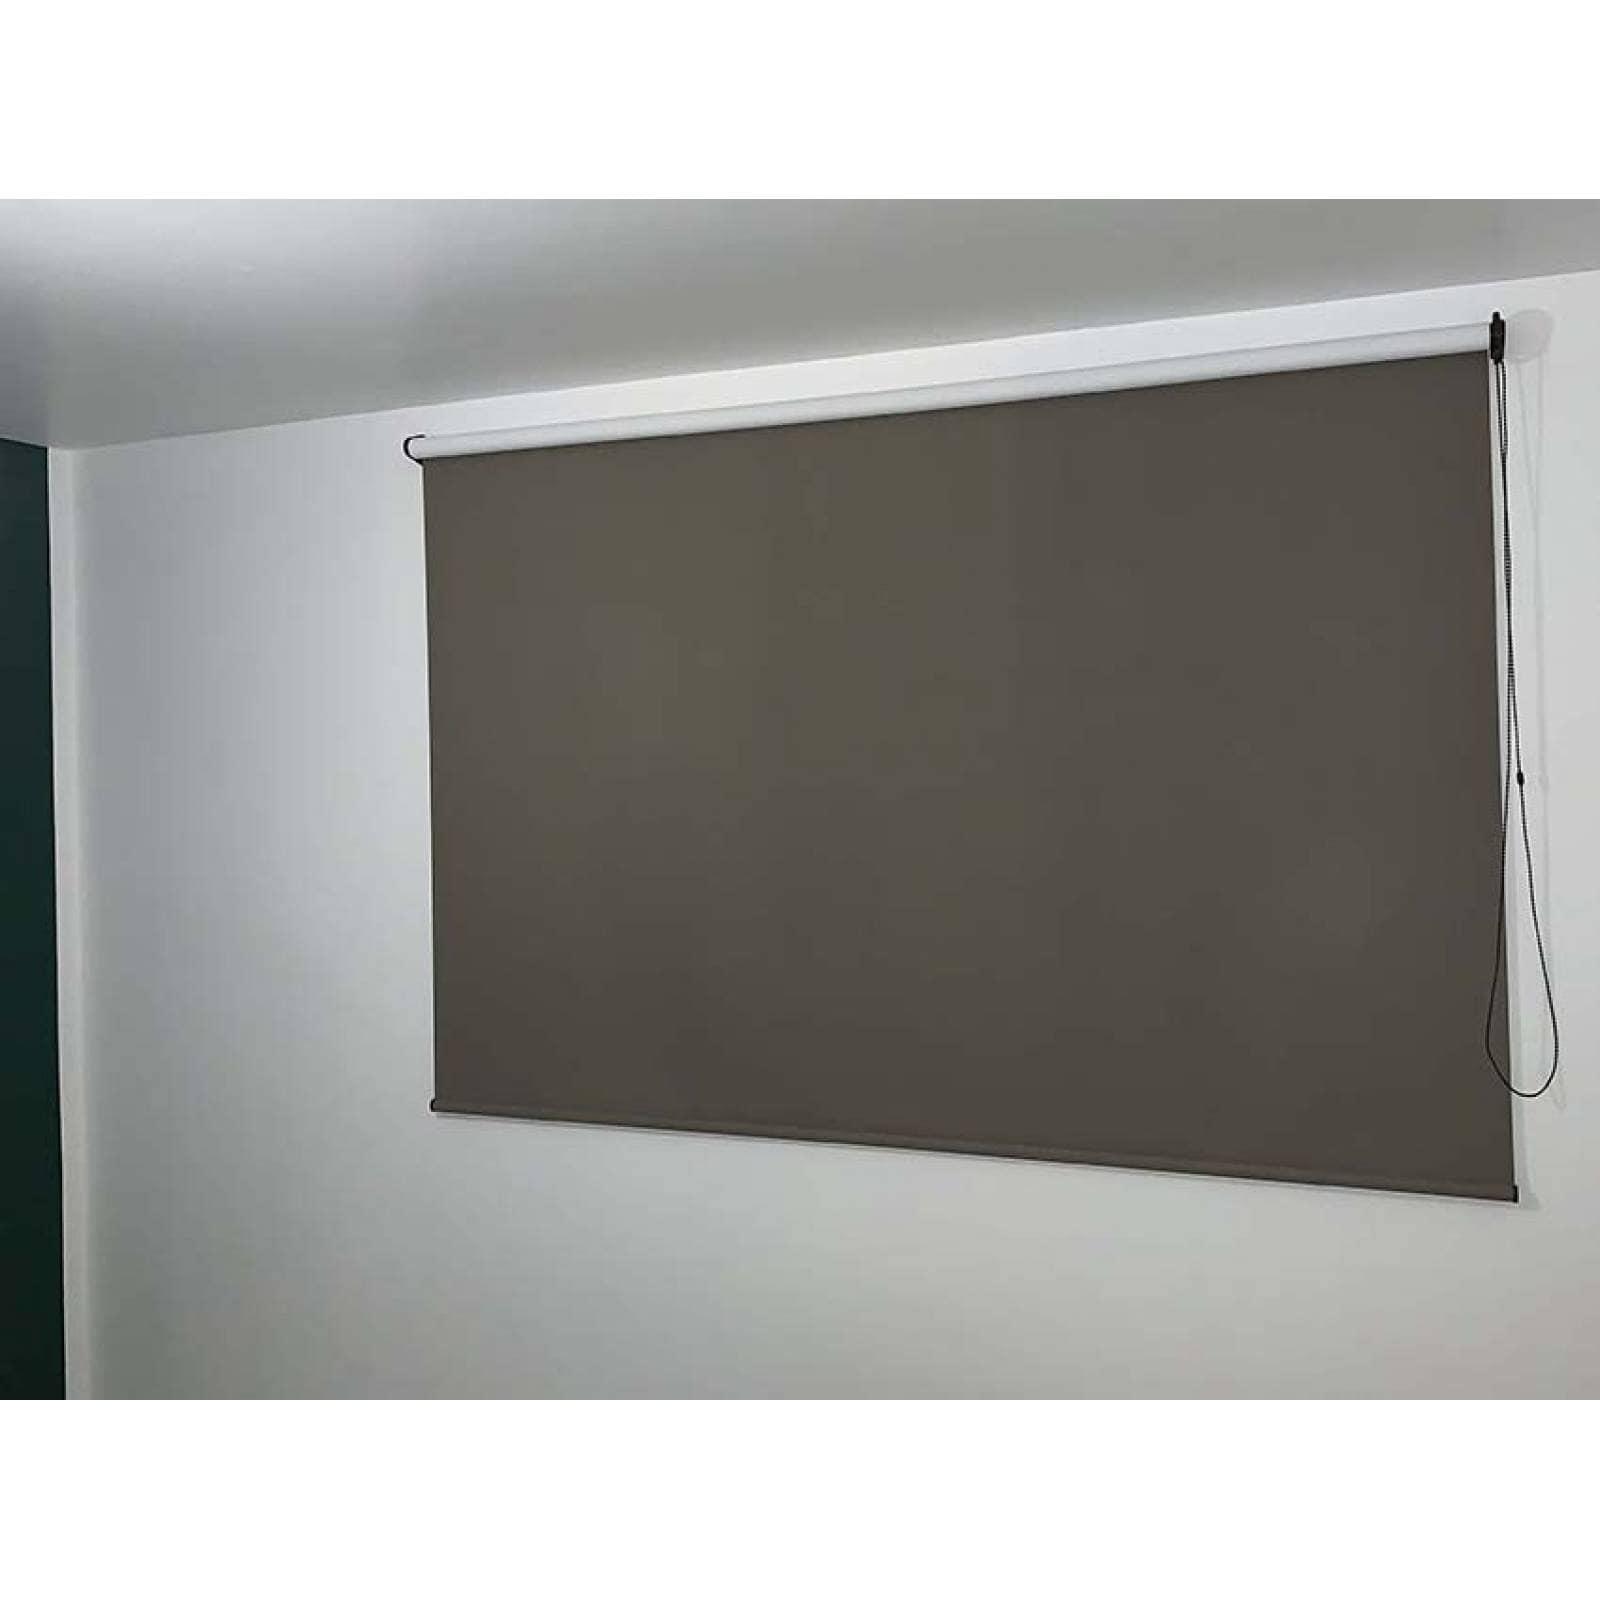 Persianas Blackout modelo Budelli 180 cm de ancho X hasta 150 cm de largo